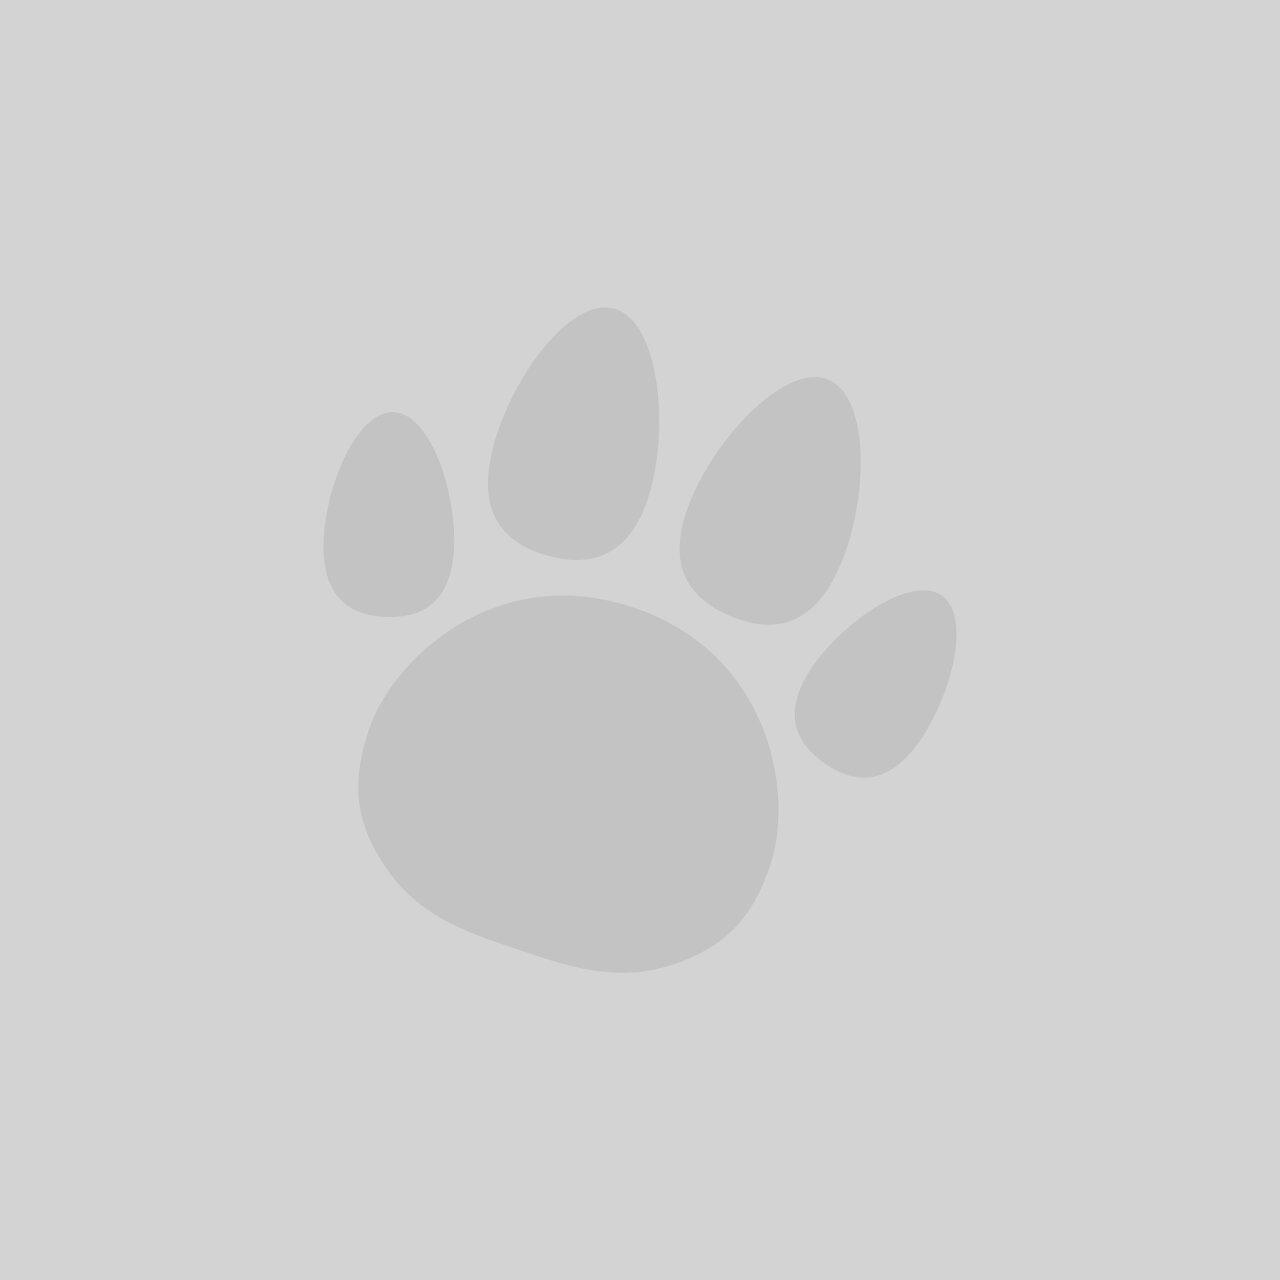 Flexi Vario Soft Stop Belt Dog Lead Attachment Medium Black